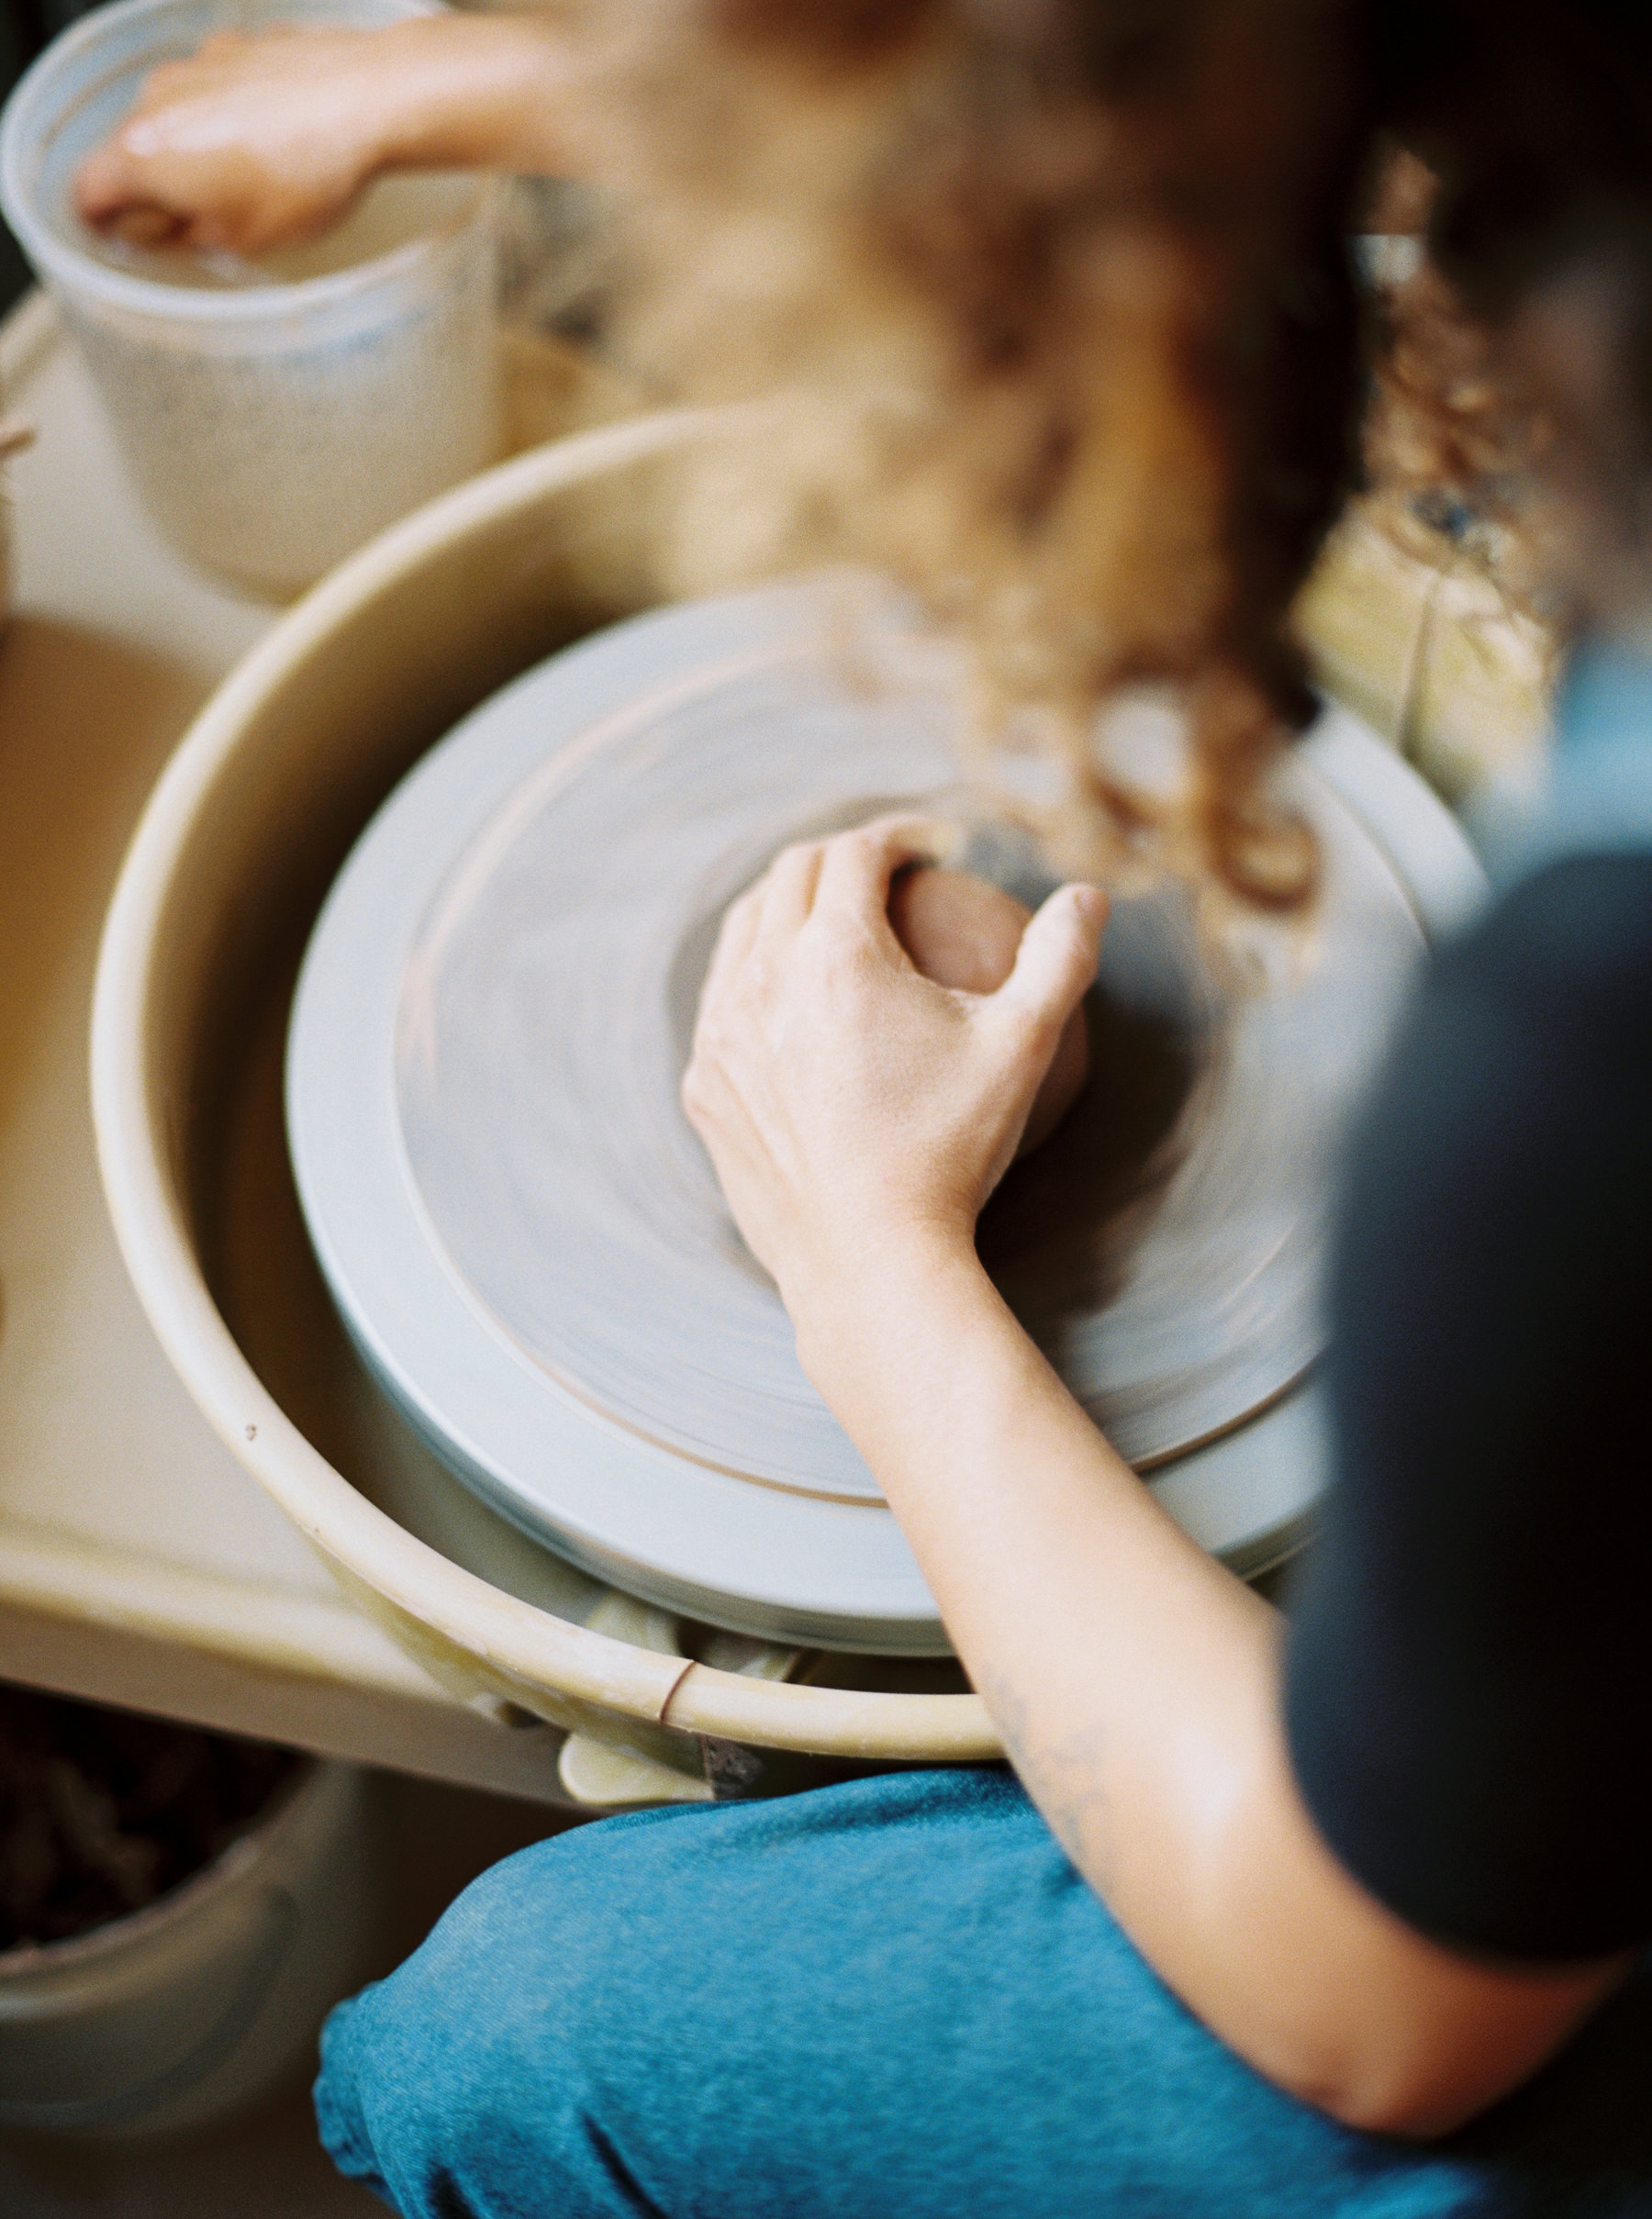 artistprofile-katherinemoes-pottery-annapeters-annapetersphoto-unearthing.tc-43.jpg